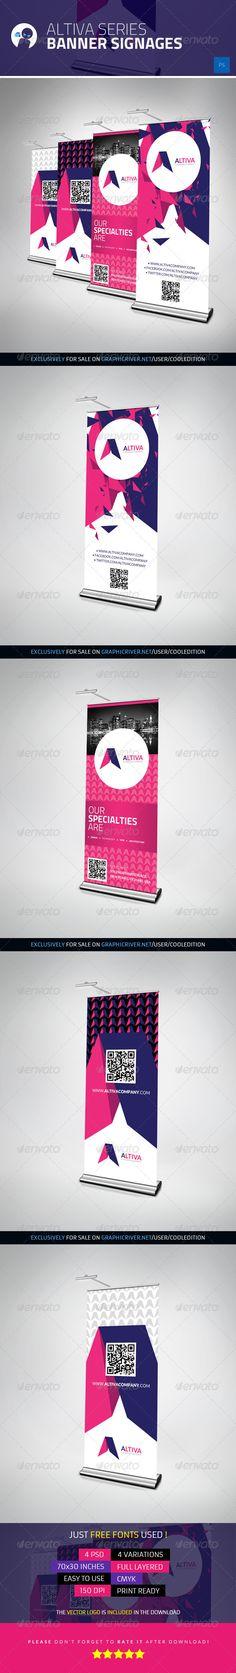 Altiva Series - Banner Signages - $8